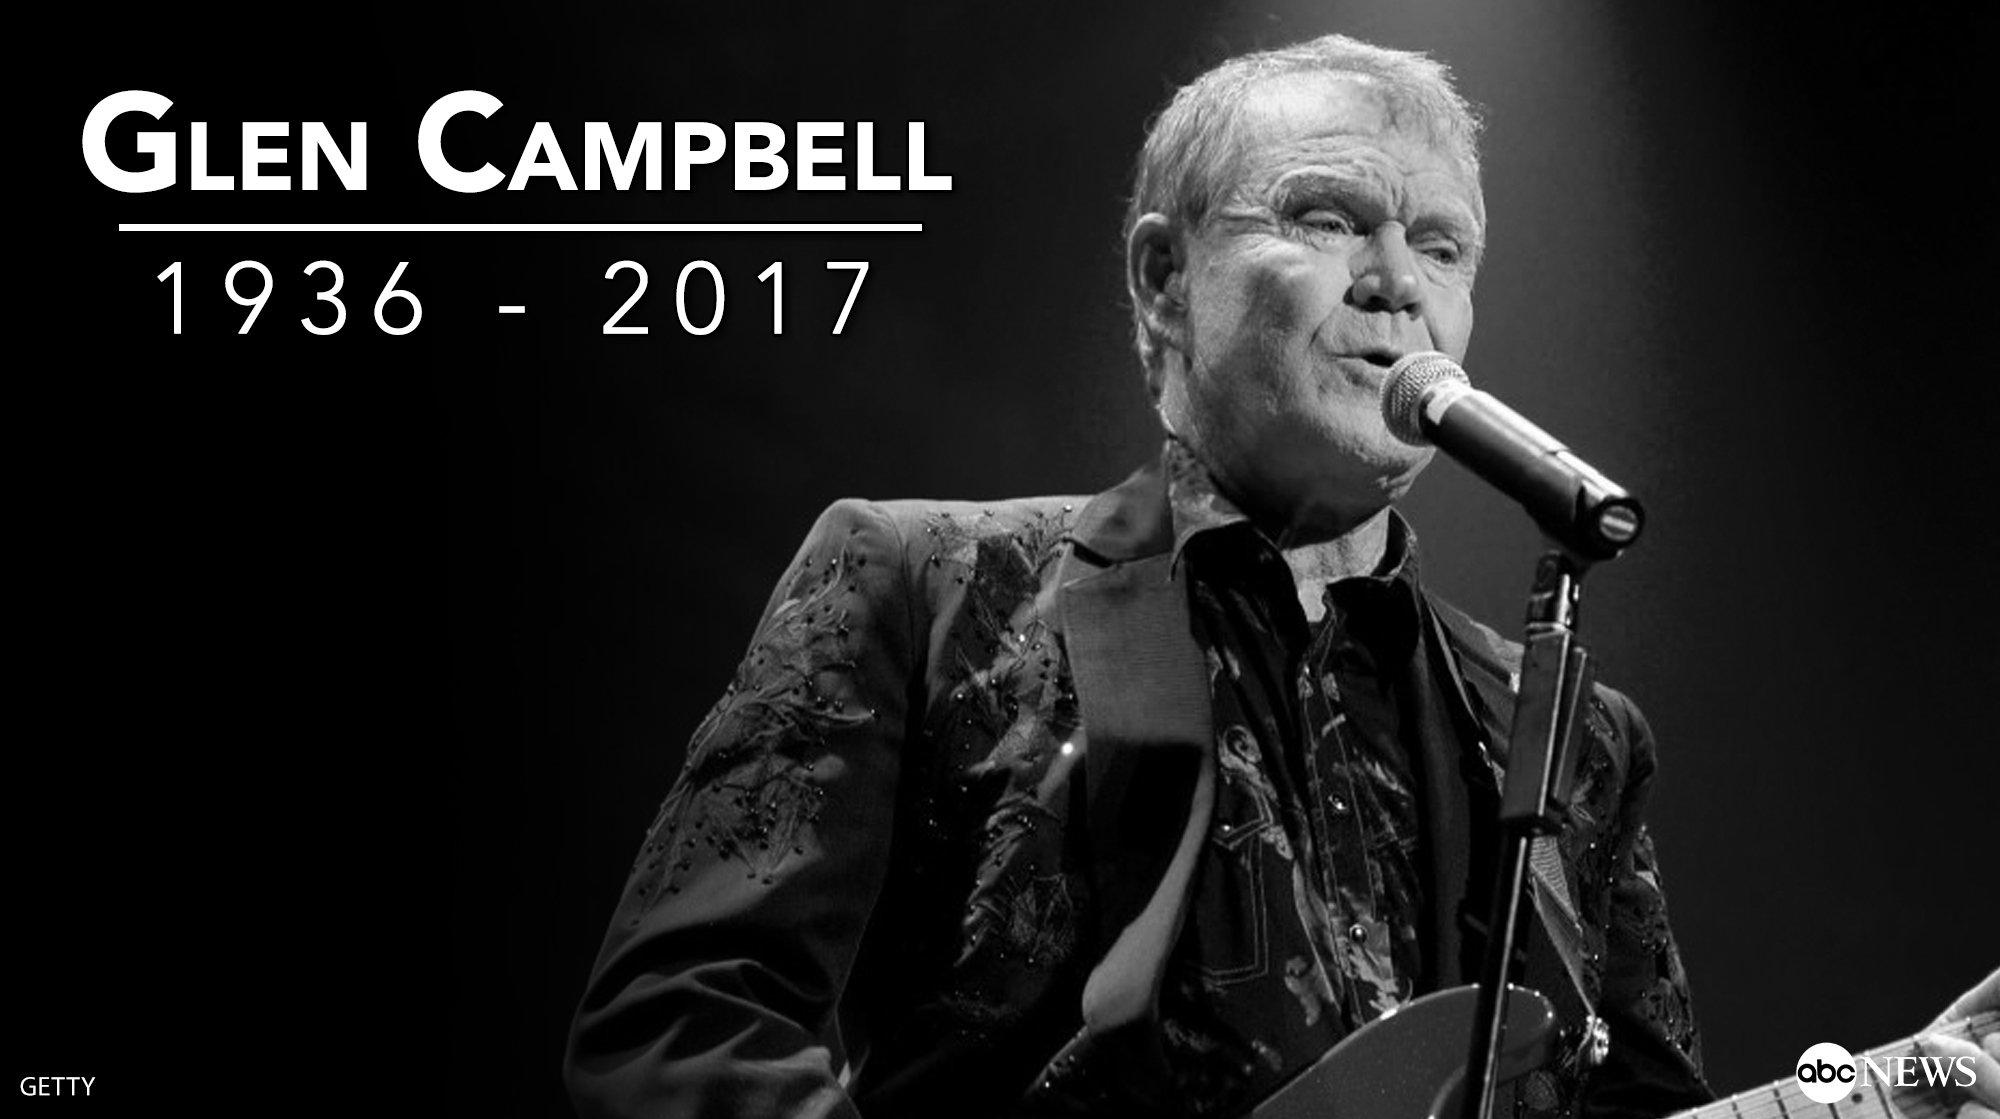 Rest in peace, Glen Campbell... https://t.co/ESbRzHakkj